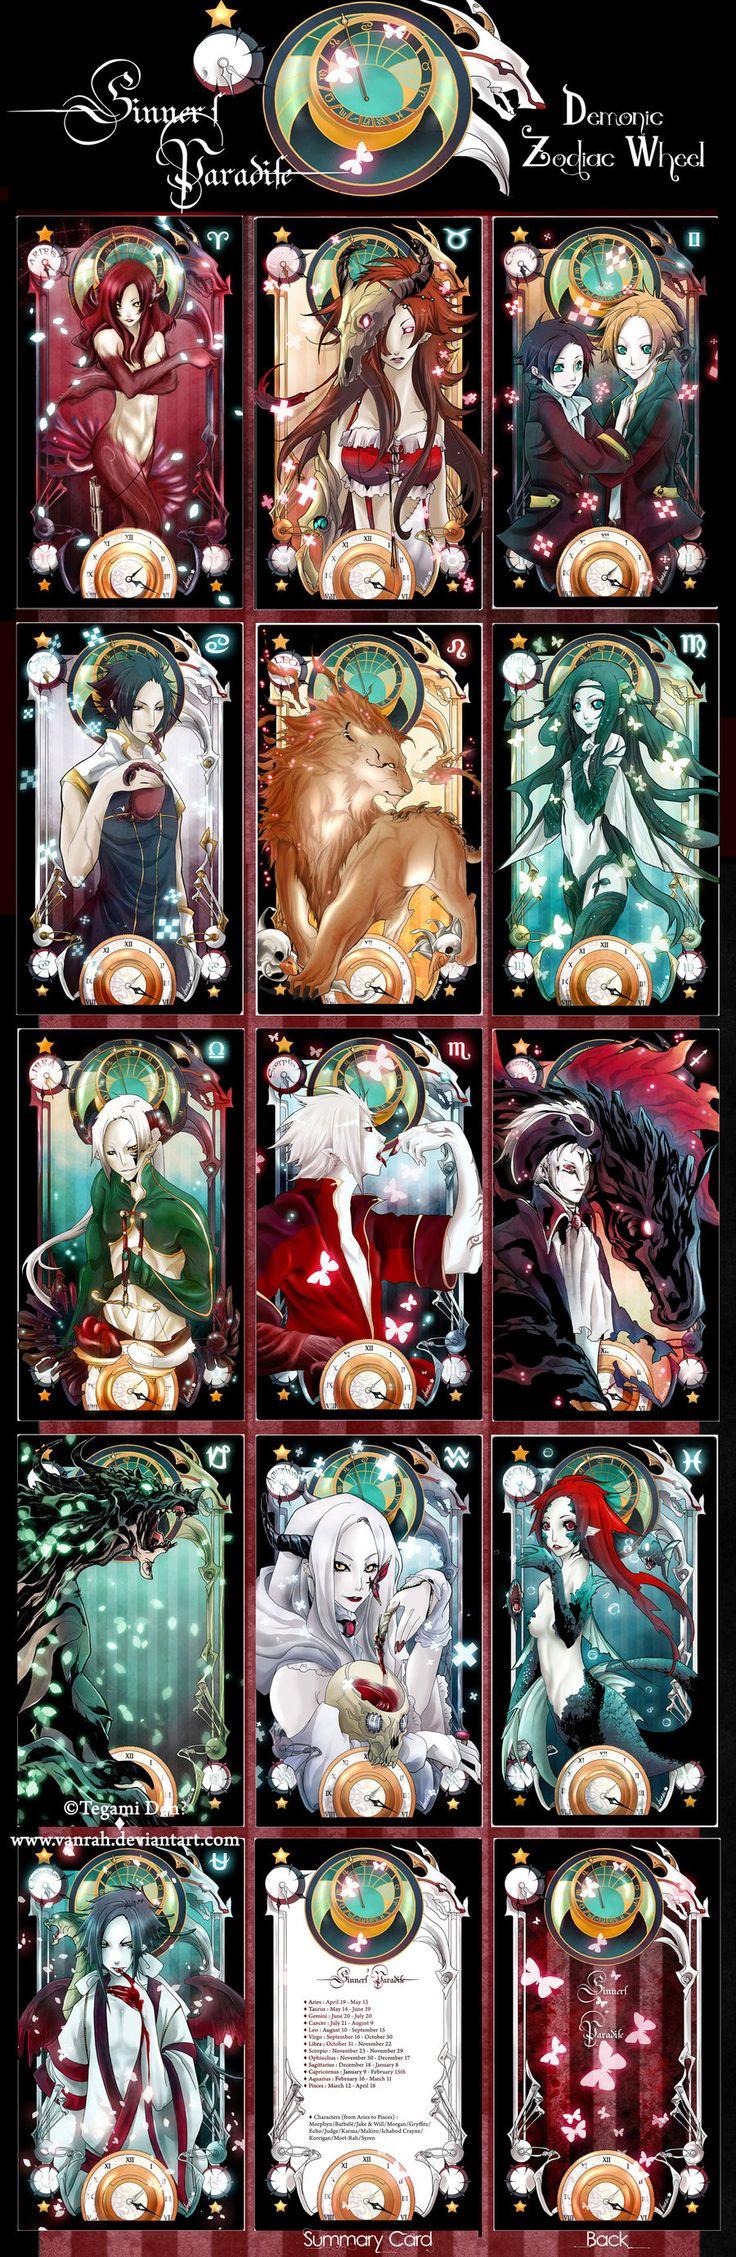 +Sinners'Paradise - Demonic Zodiac deck+ by *VanRah on deviantART